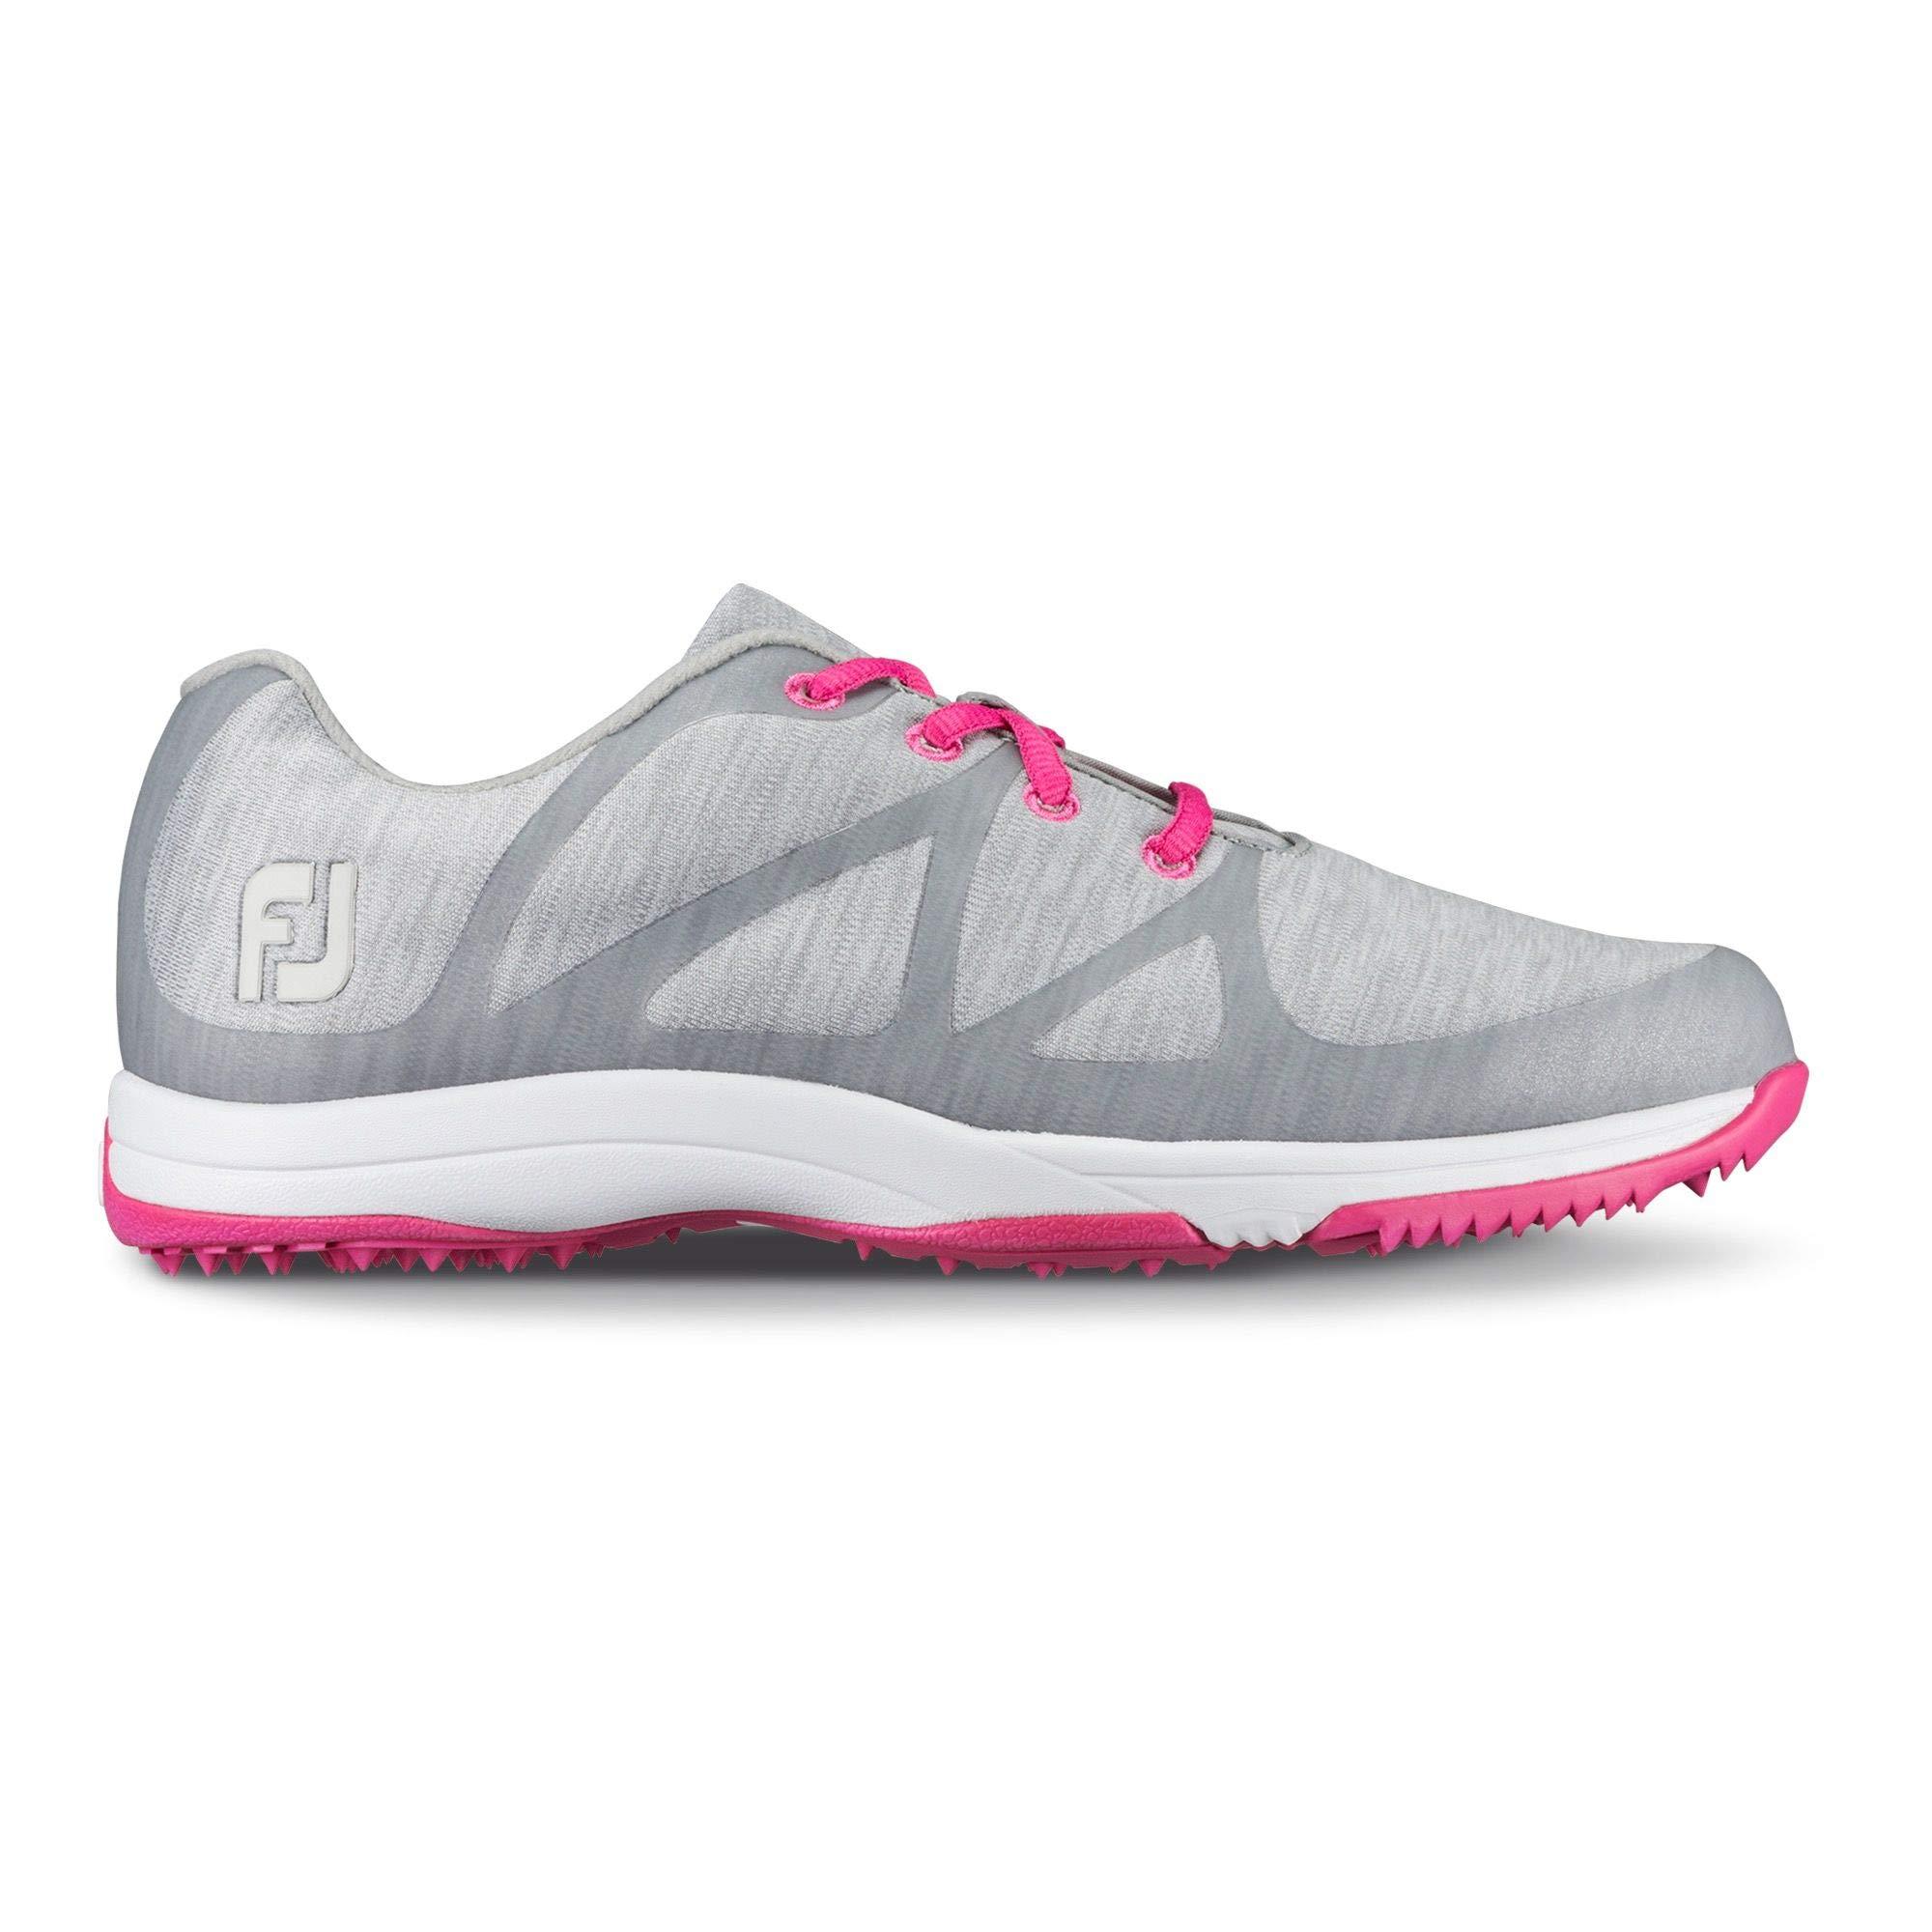 FootJoy Women's Leisure-Previous Season Style Golf Shoes Grey 5 M, Light US